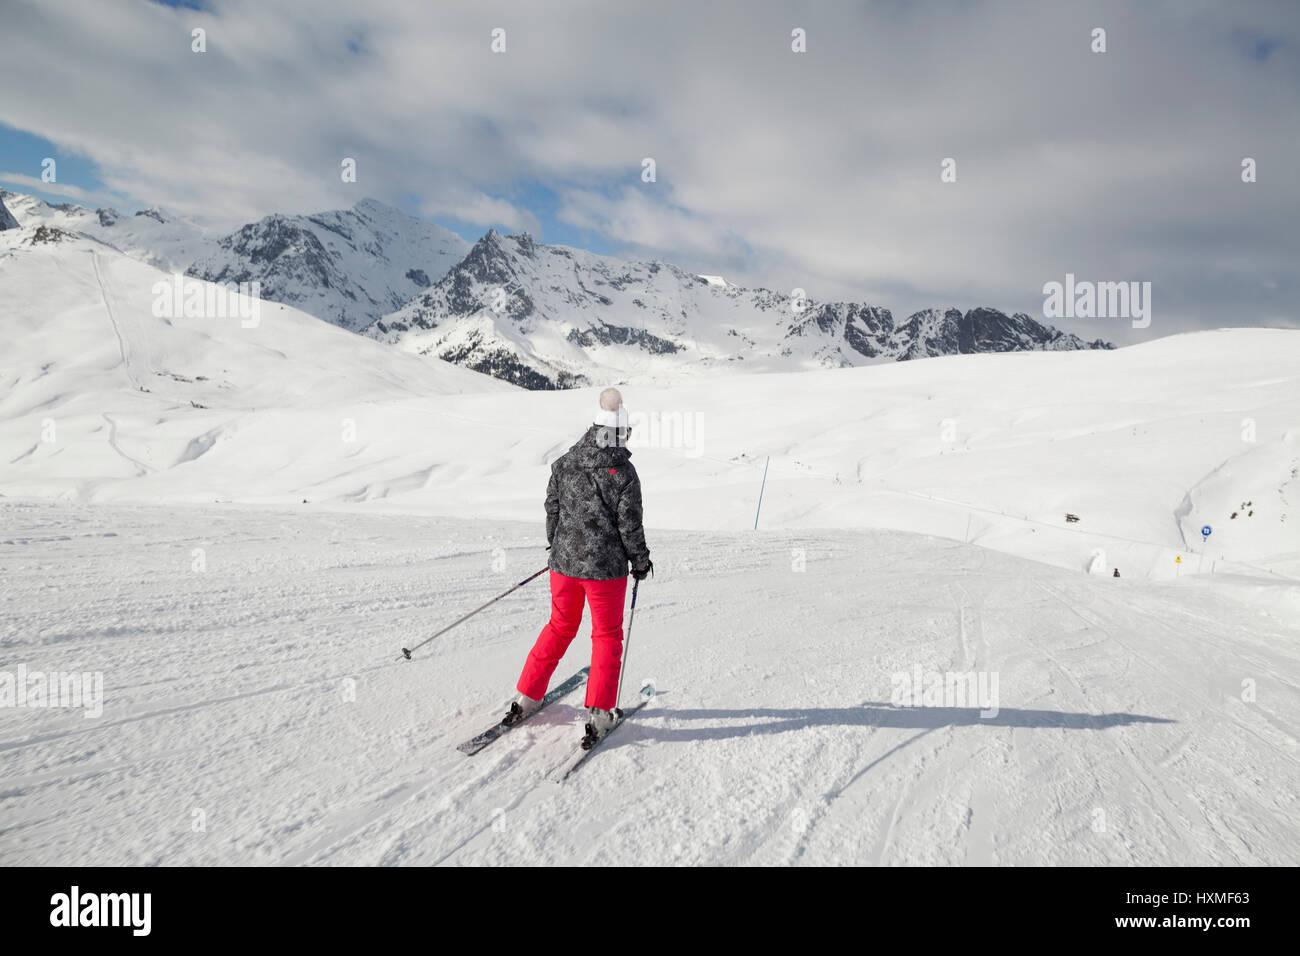 A skier at Domaine de Balme ski resort in Le Tour outside of Chamonix-Mont-Blanc. - Stock Image